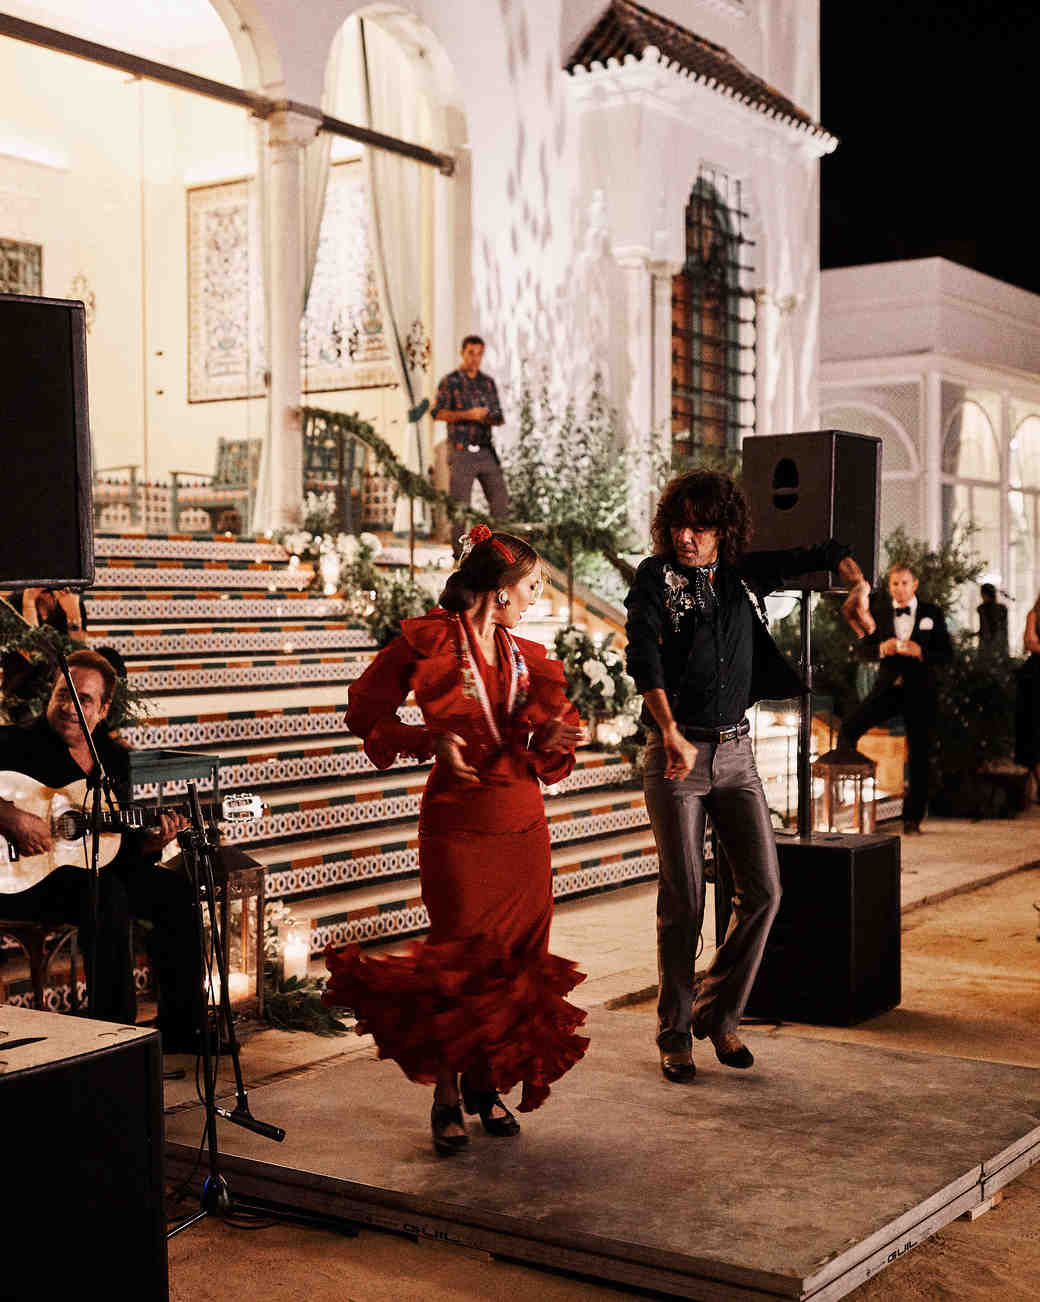 karolina sorab wedding flamenco dancers reception